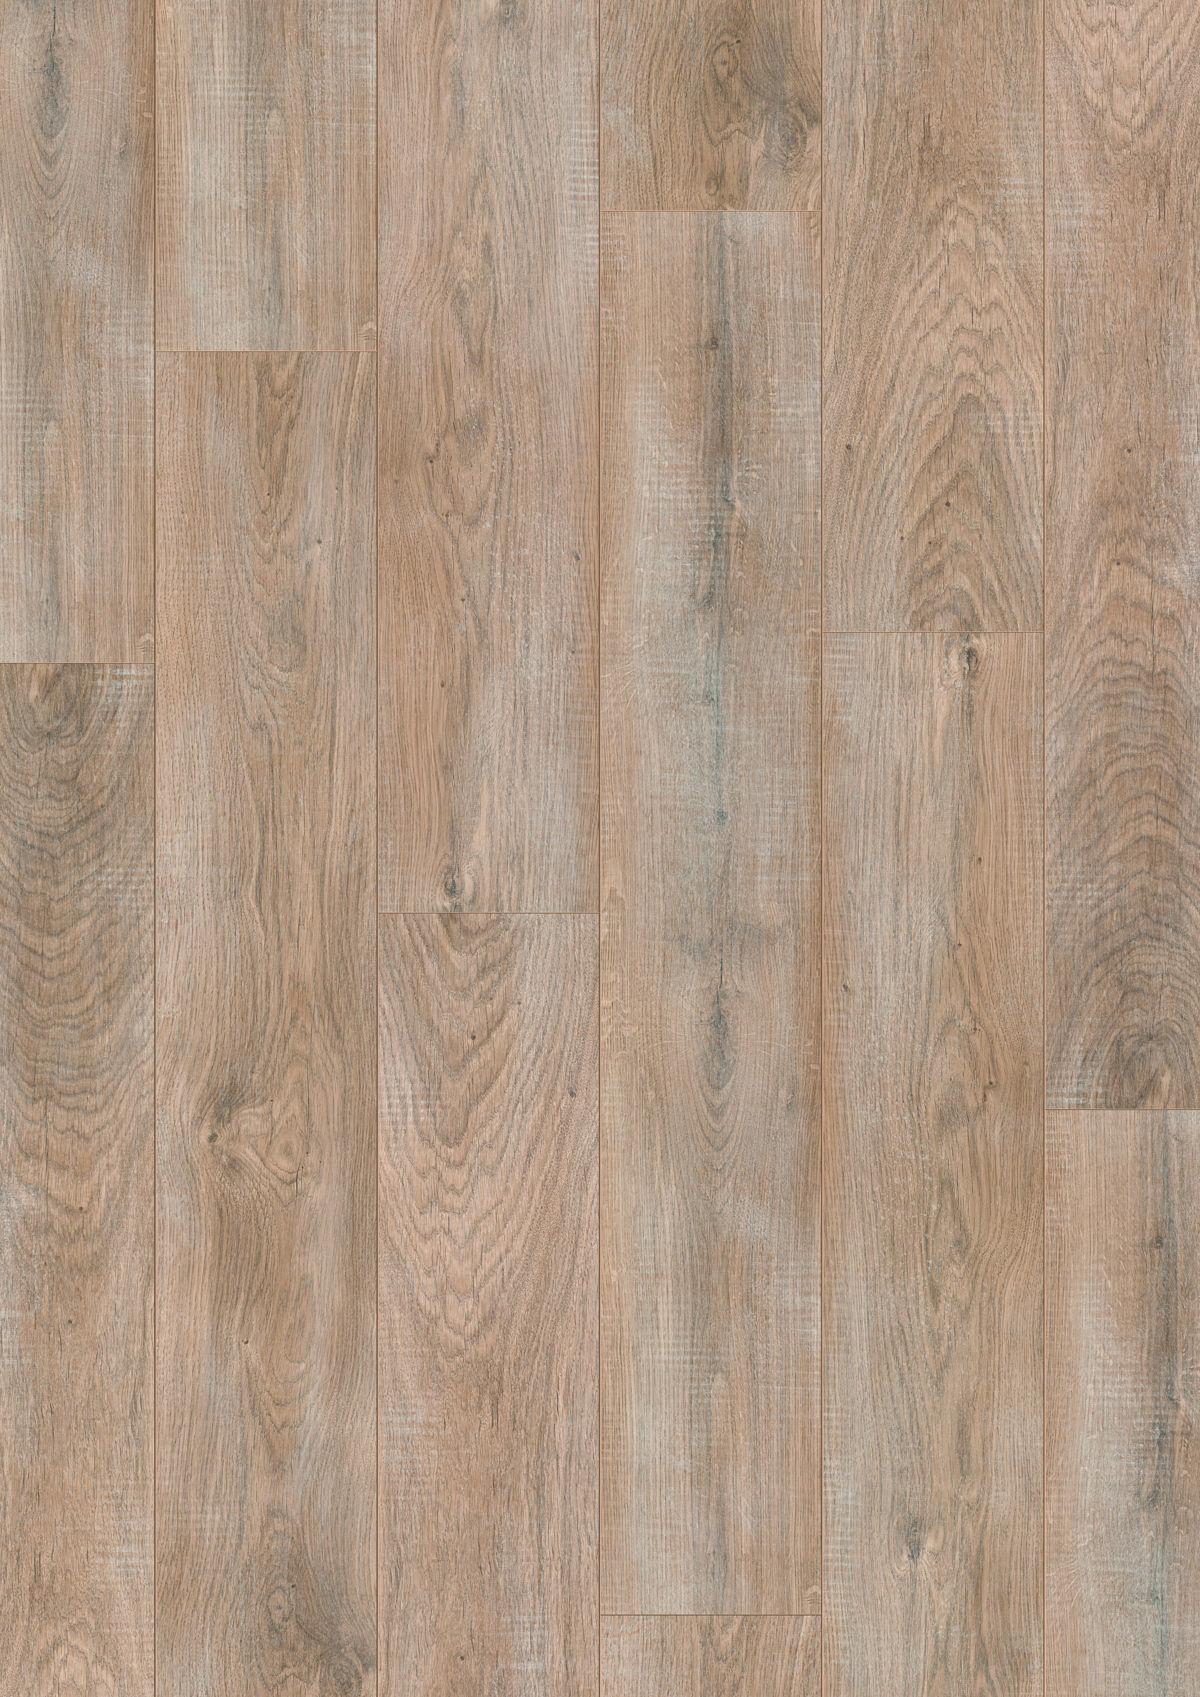 Pergo Living Expression Chalked Blonde Oak Laminate Flooring